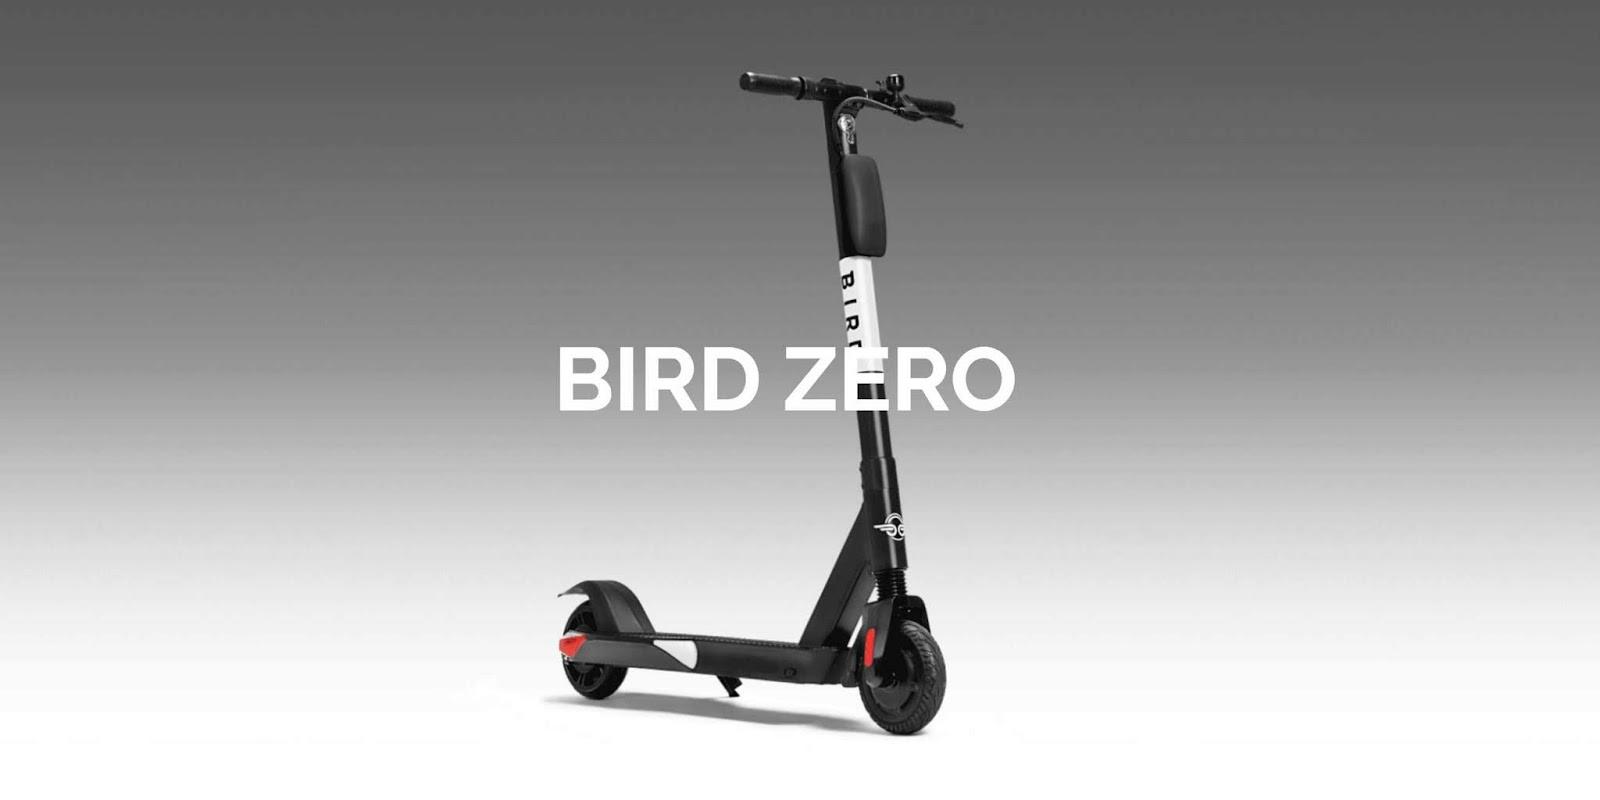 Bird Zero Dockless Electric Scooter